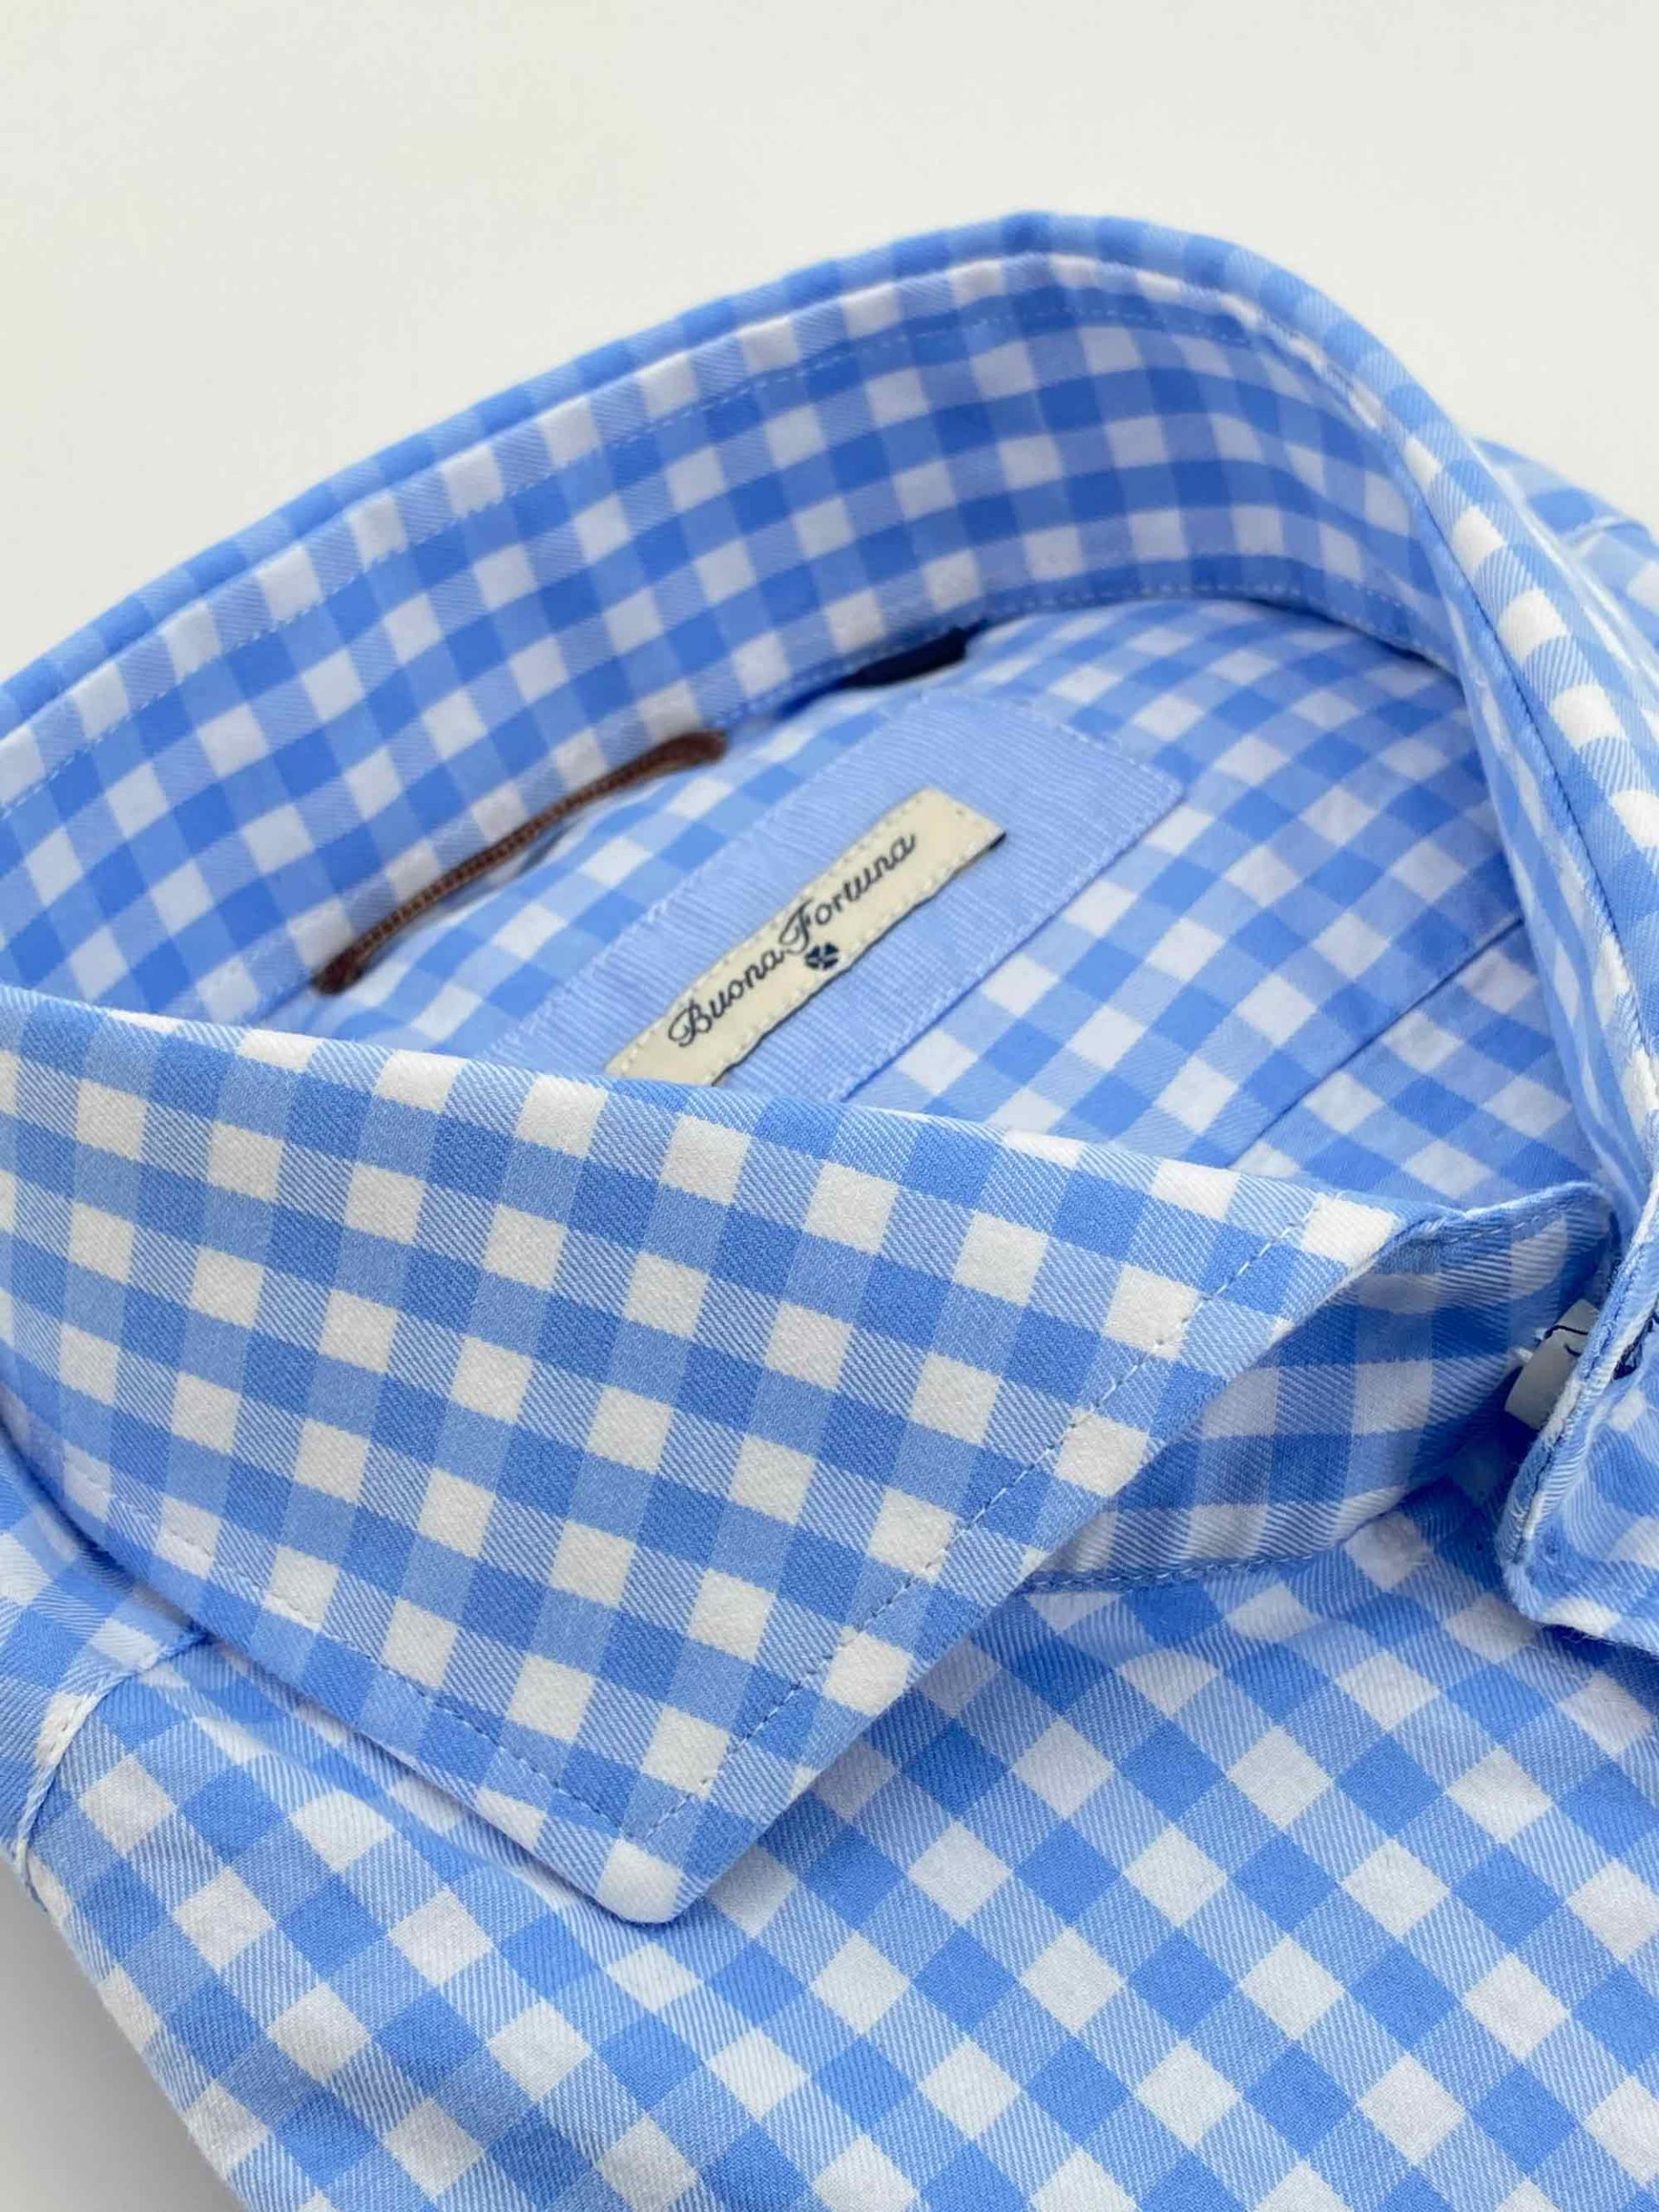 camisas buona fortuna comprar online camisas italianas exlusivas twill cuadros azules detalle